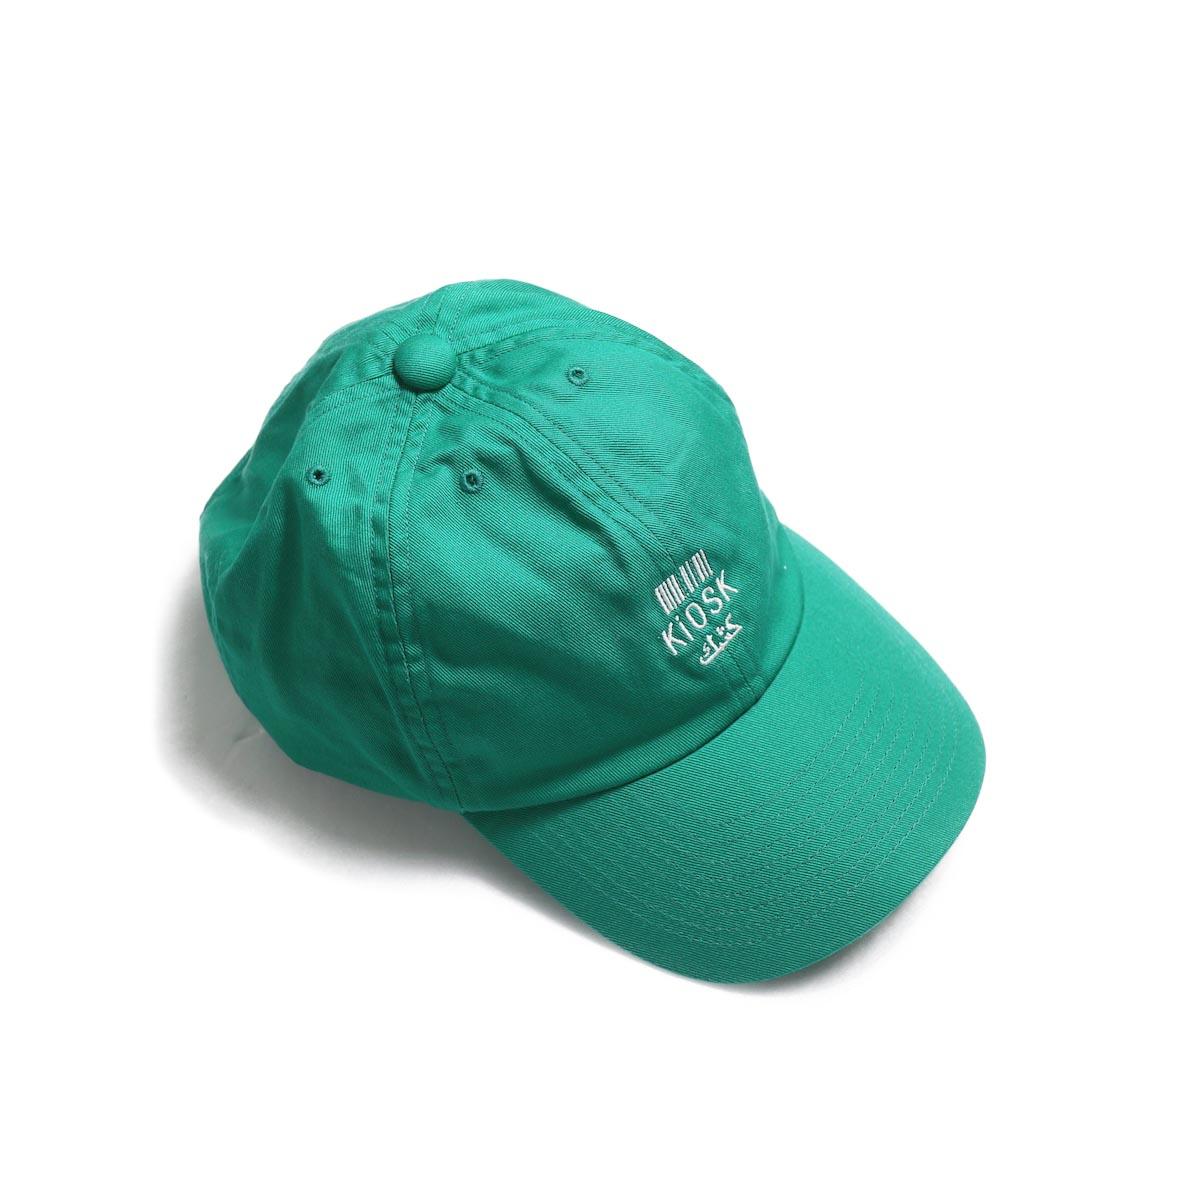 COMESANDGOES / Embroidery Cap (NO.14520) mintgreen